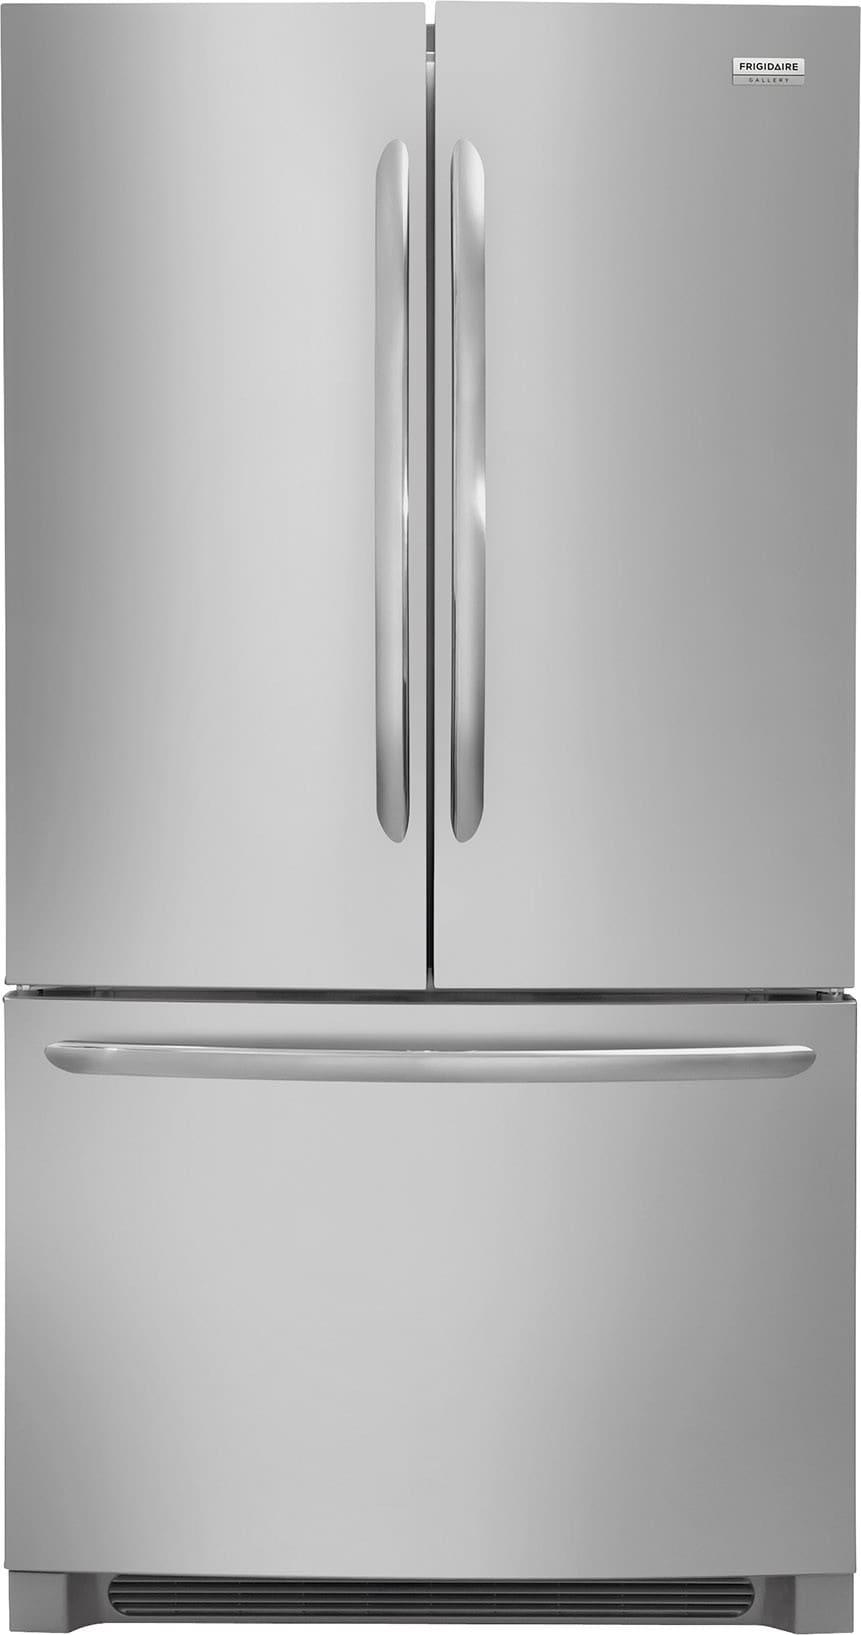 Frigidaire Fghg2368tf 36 Inch Counter Depth French Door Refrigerator With Adjustable Interior